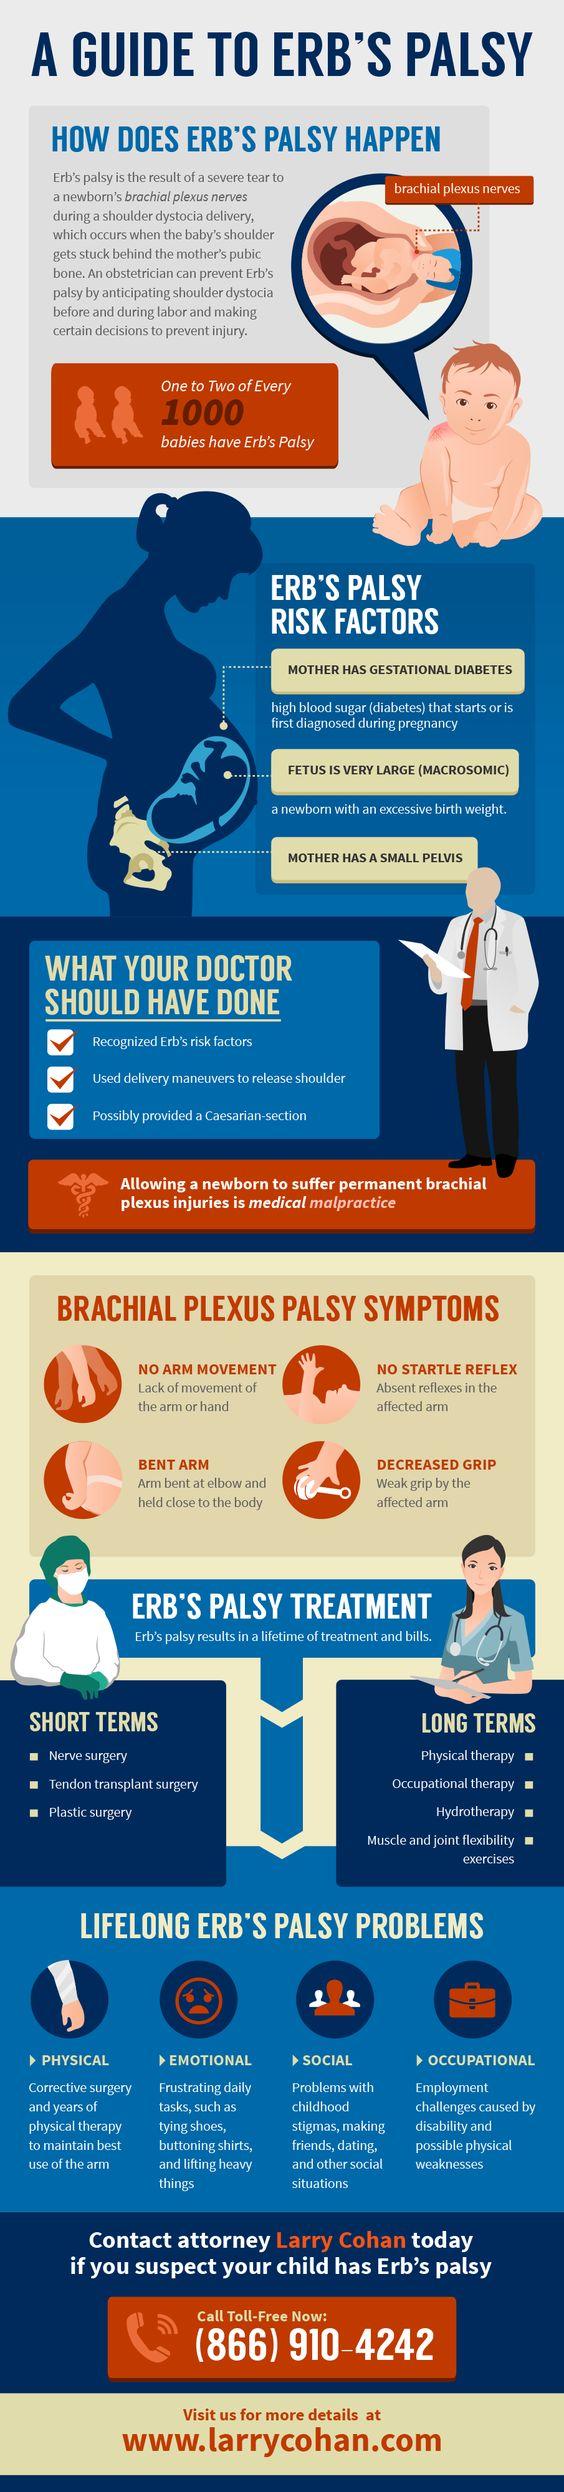 How Does Erb's Palsy Happen   #Infographic #Health #NewbornBaby #ErbsPalsy